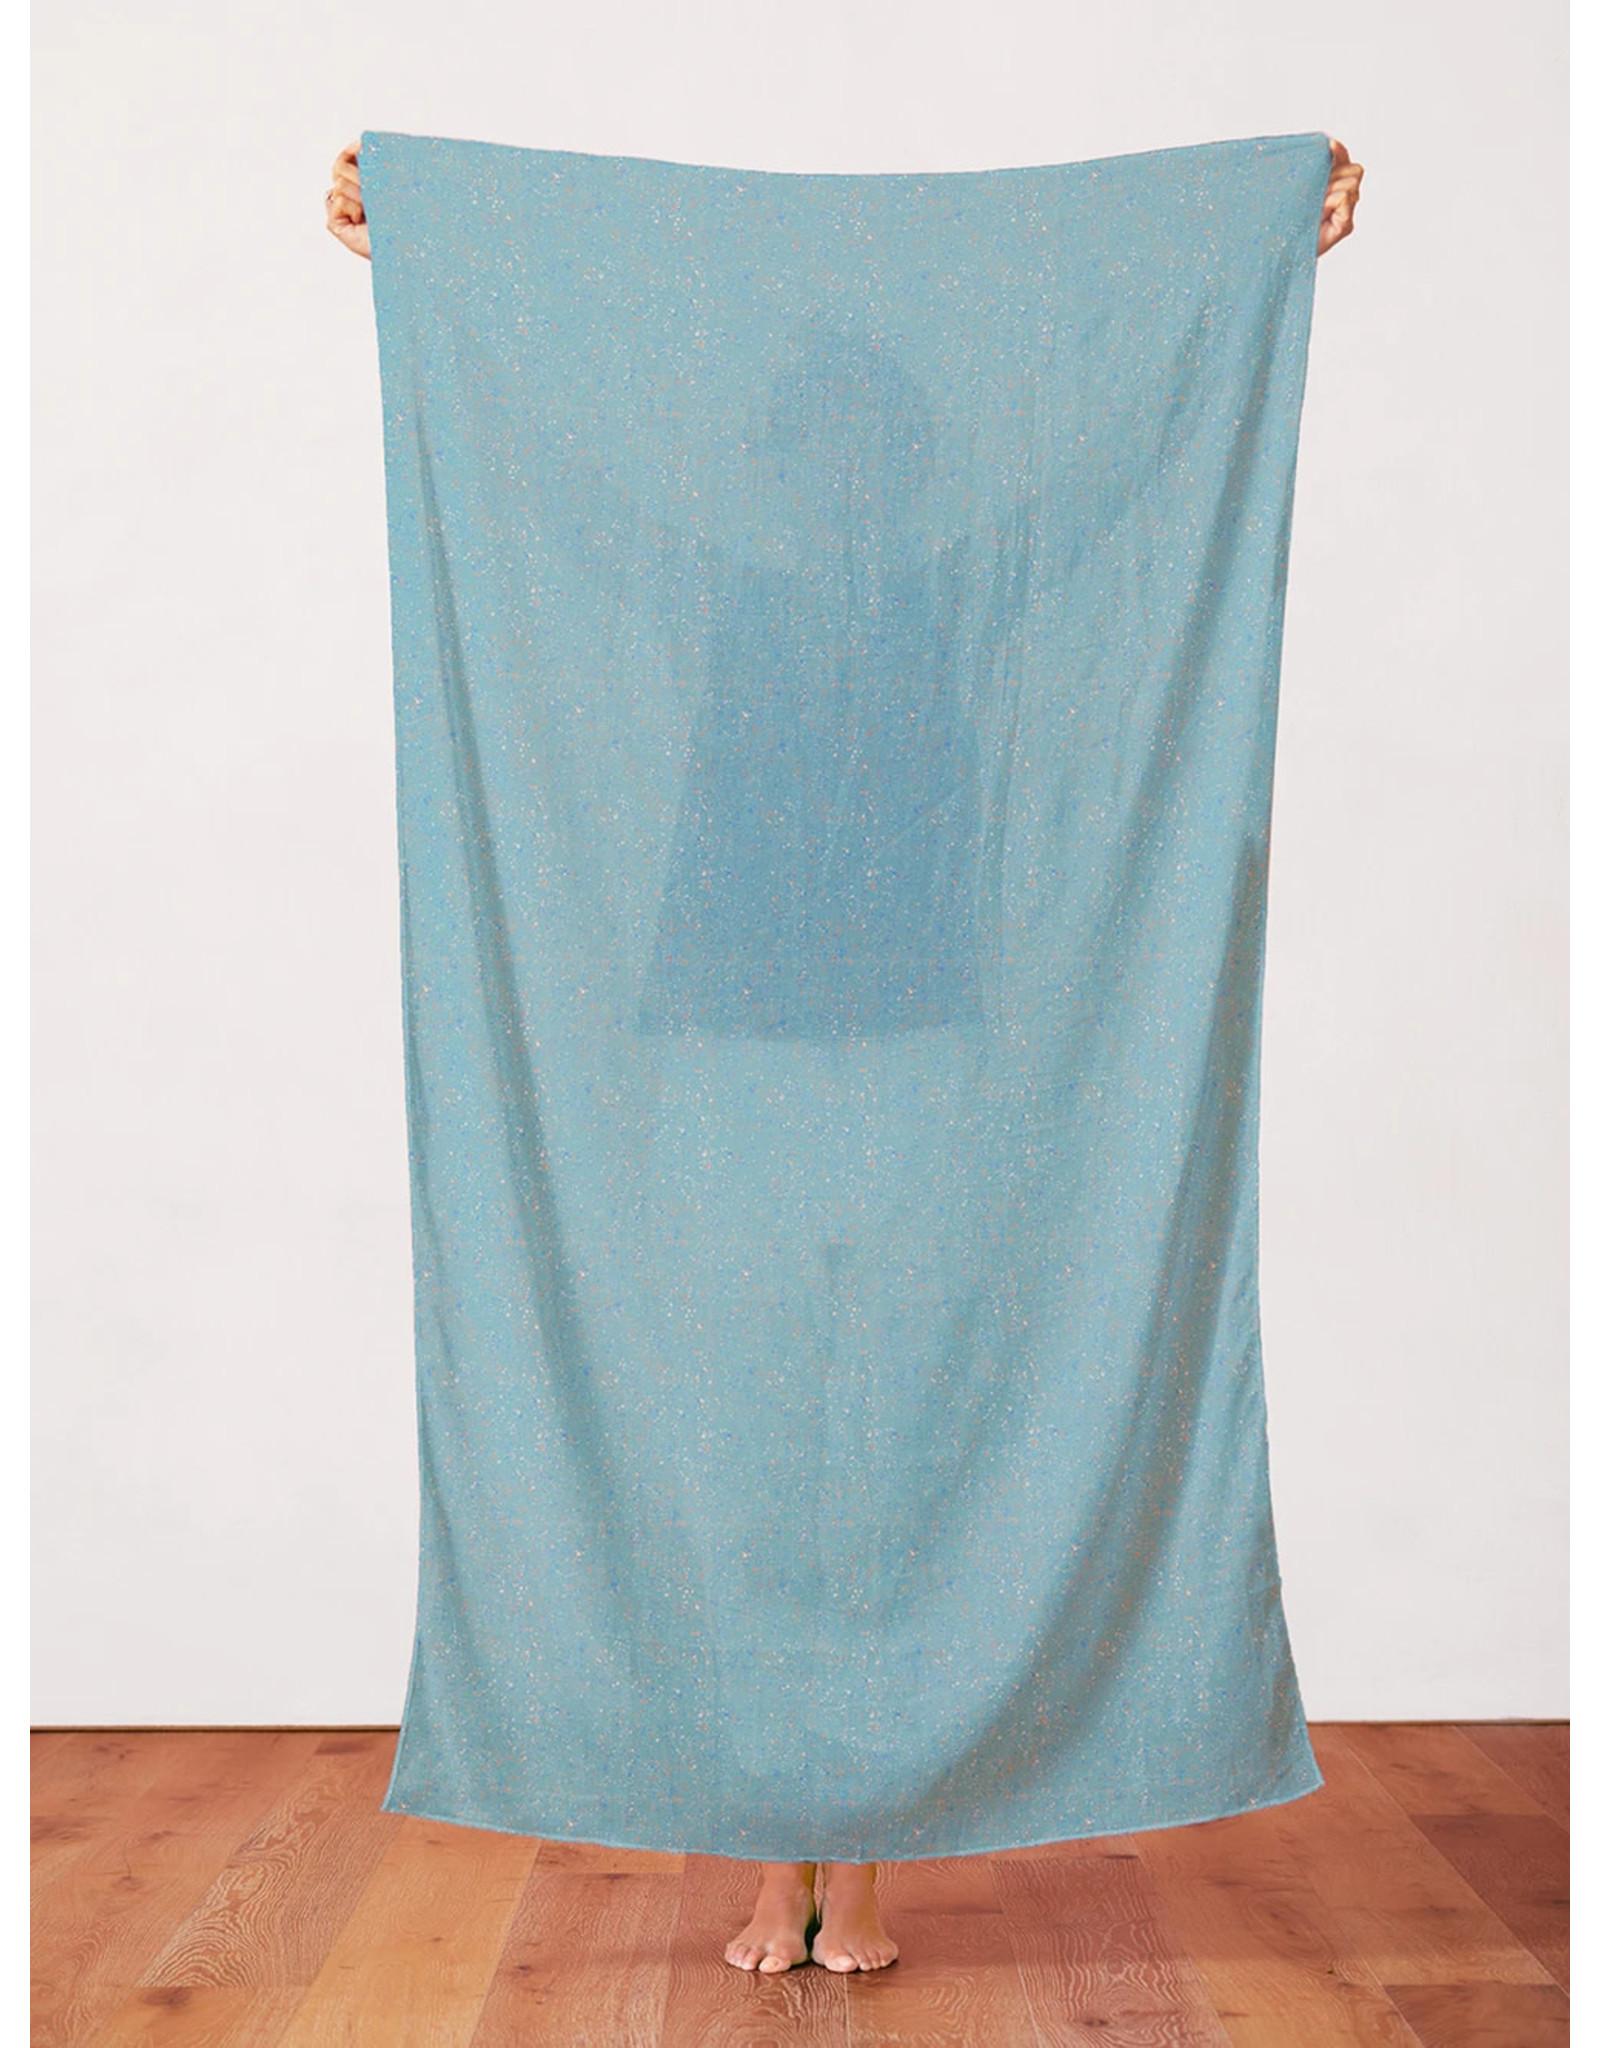 Paintbrush Studio Organic Double Gauze, Rainbow Dust in Granite Teal, Fabric Half-Yards